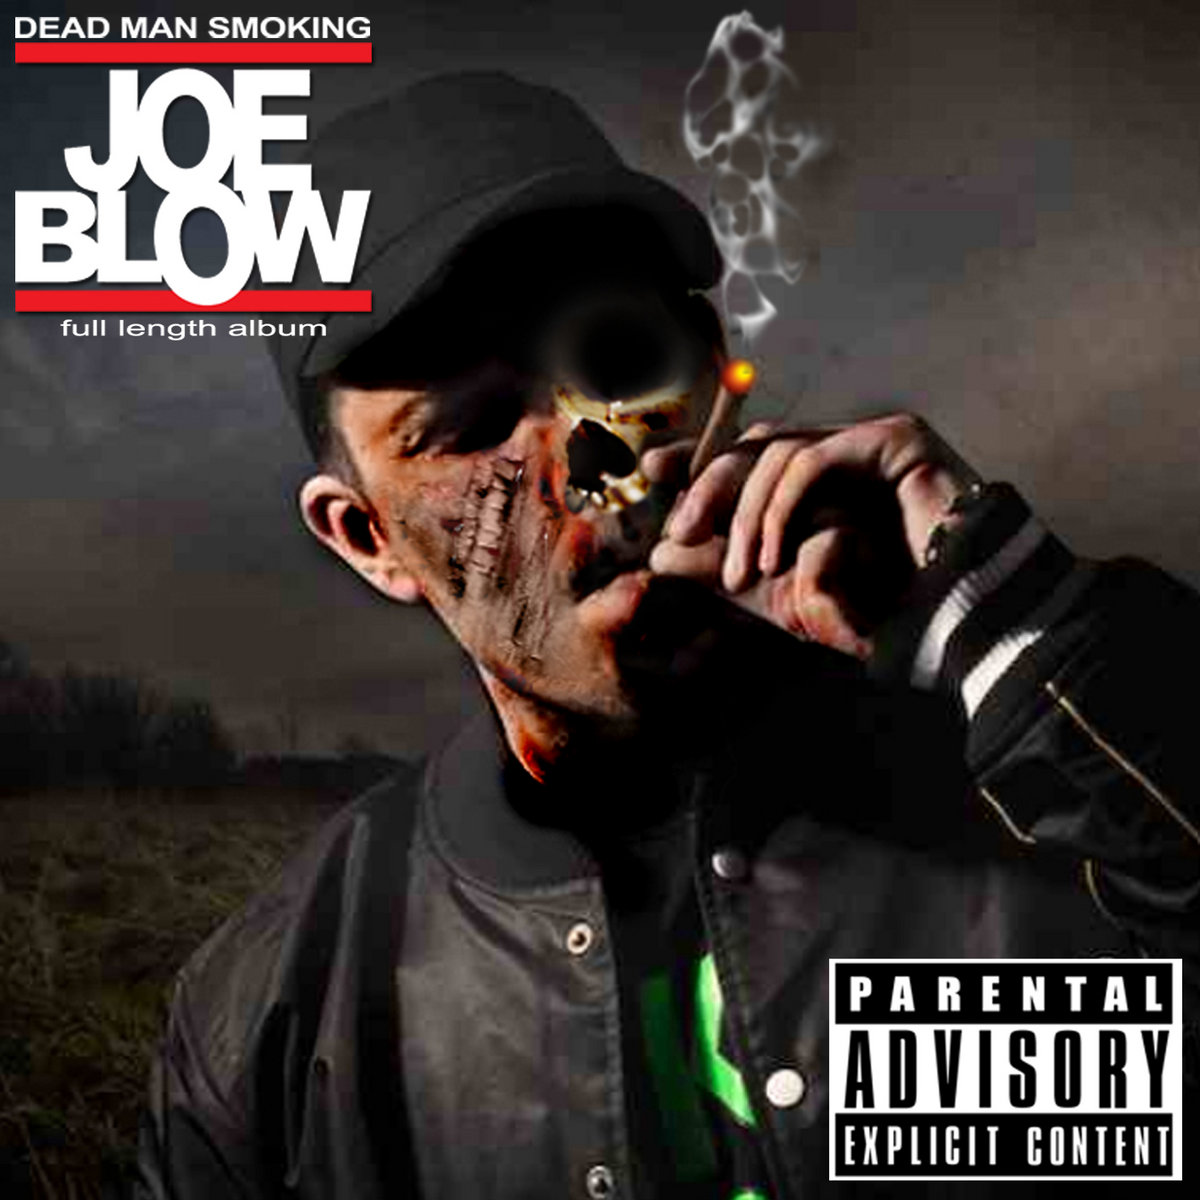 Blow free movie